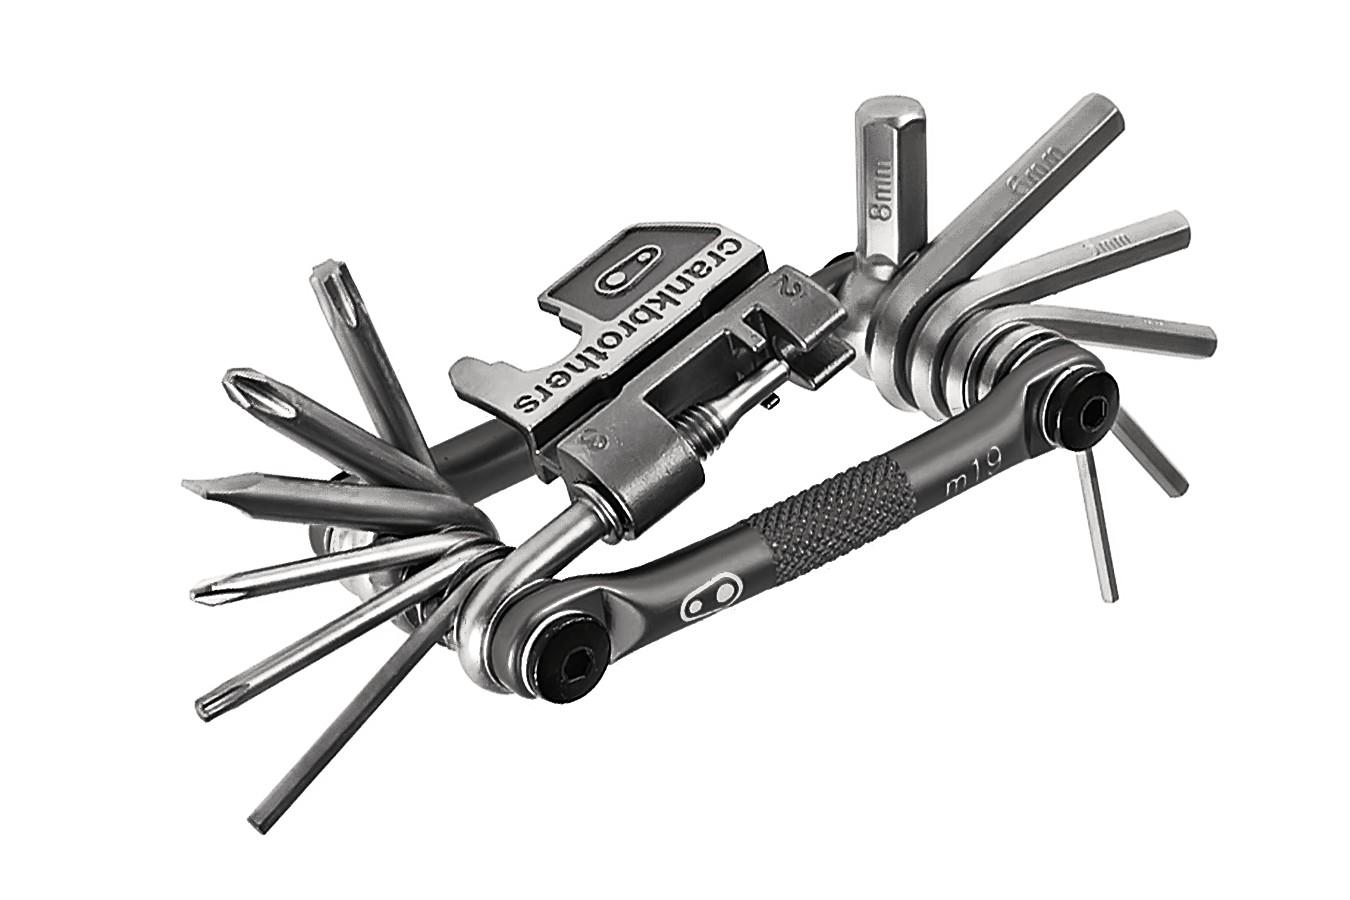 Kit Ferramentas Bike Canivete 19 Funções - Crank Brothers